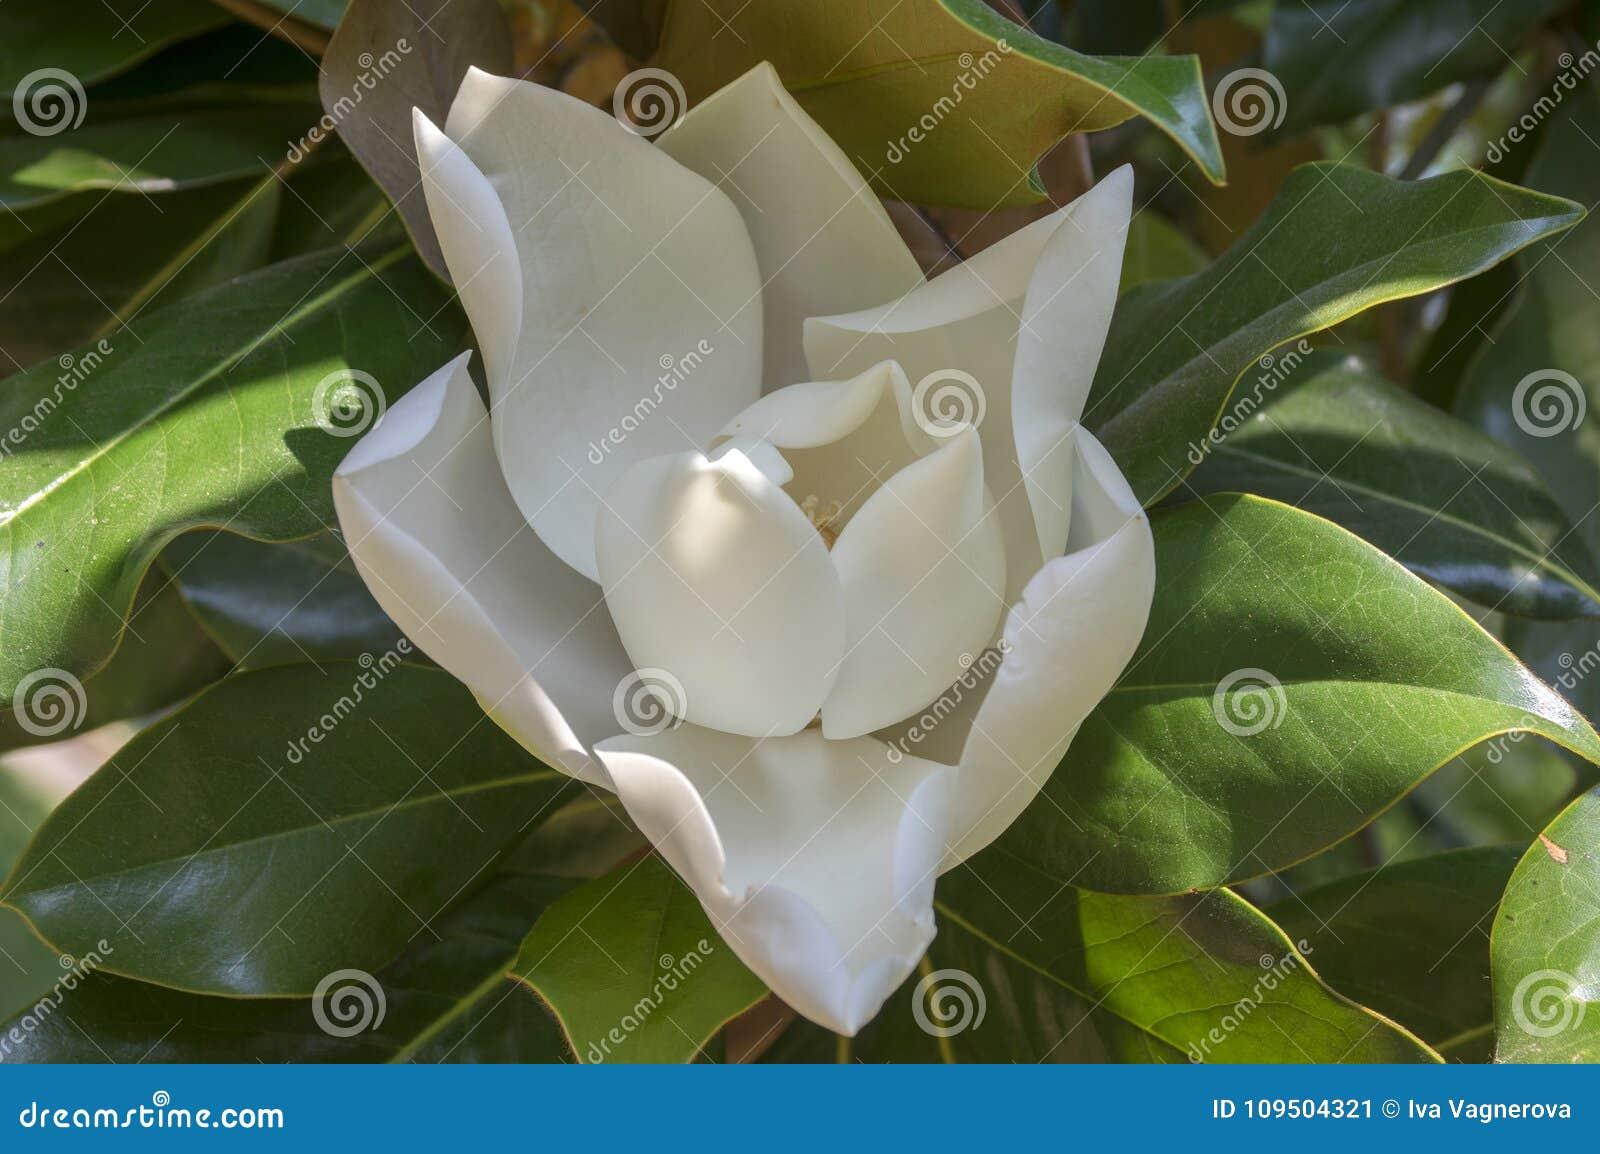 Magnolia Grandiflora White Amazing Tree Flower In Bloom Stock Image